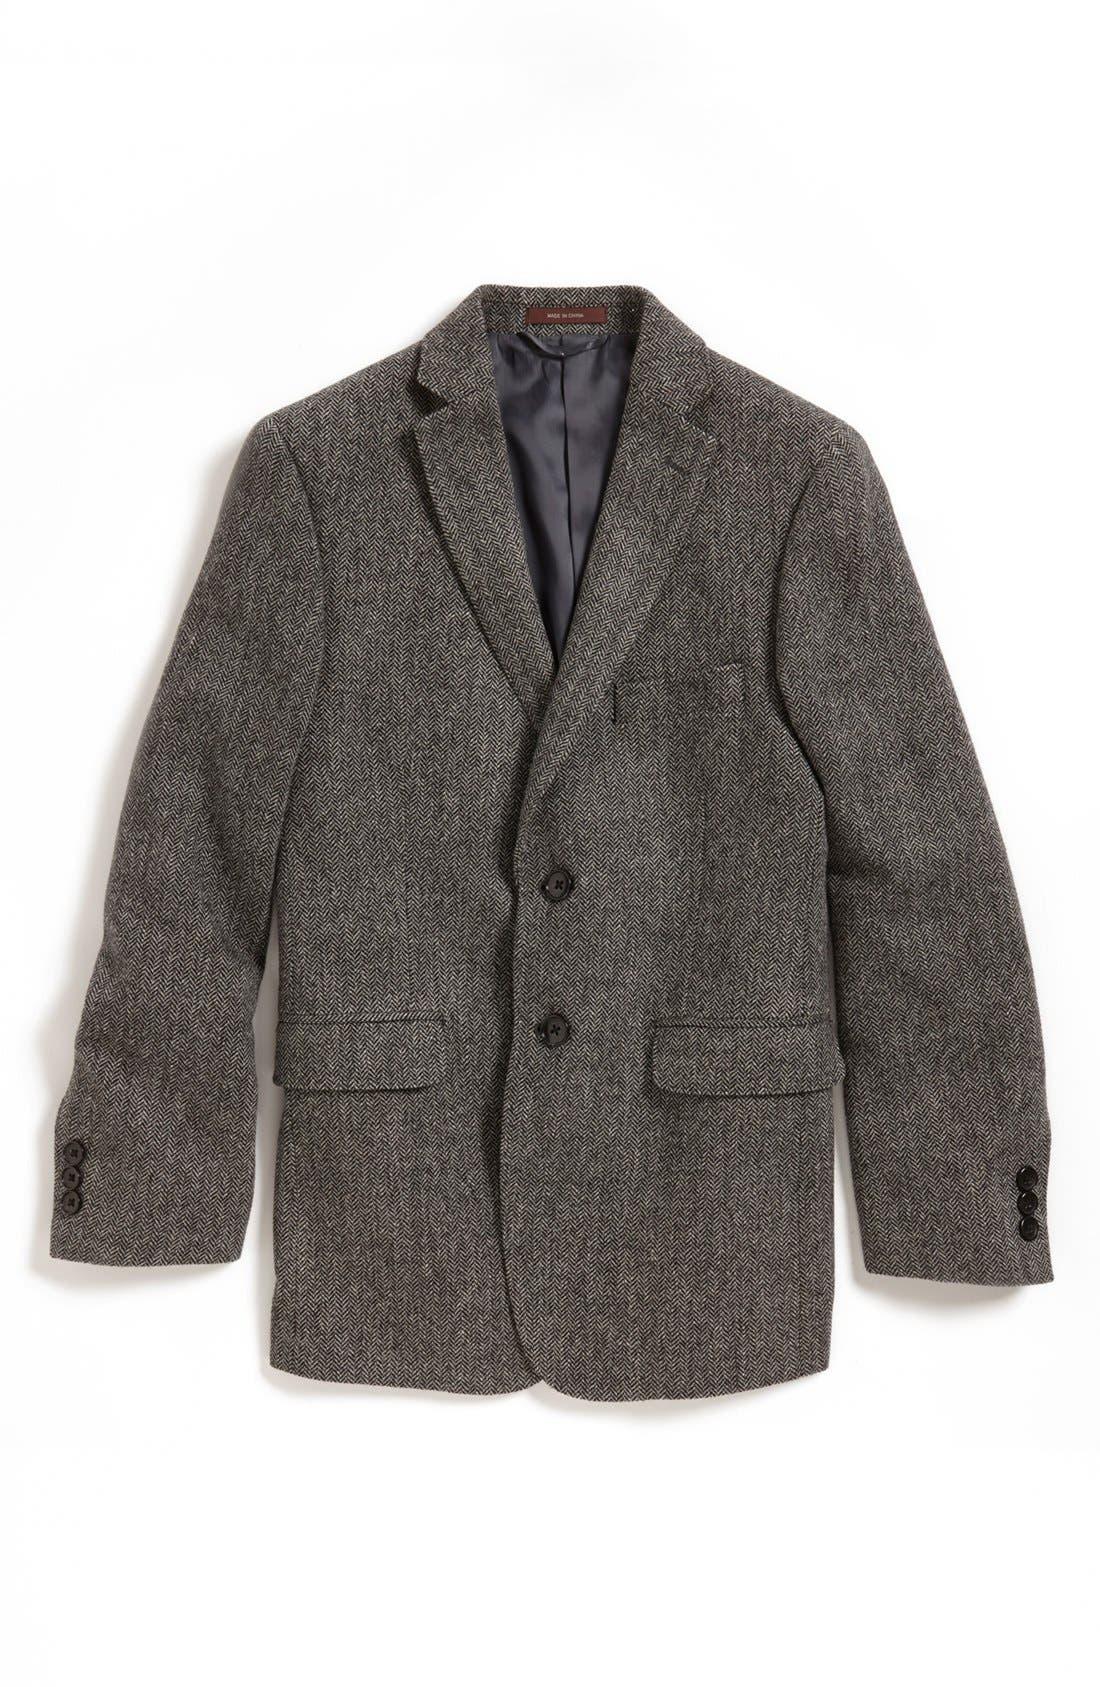 Alternate Image 1 Selected - Hickey Freeman Wool Blend Sport Coat (Big Boys)